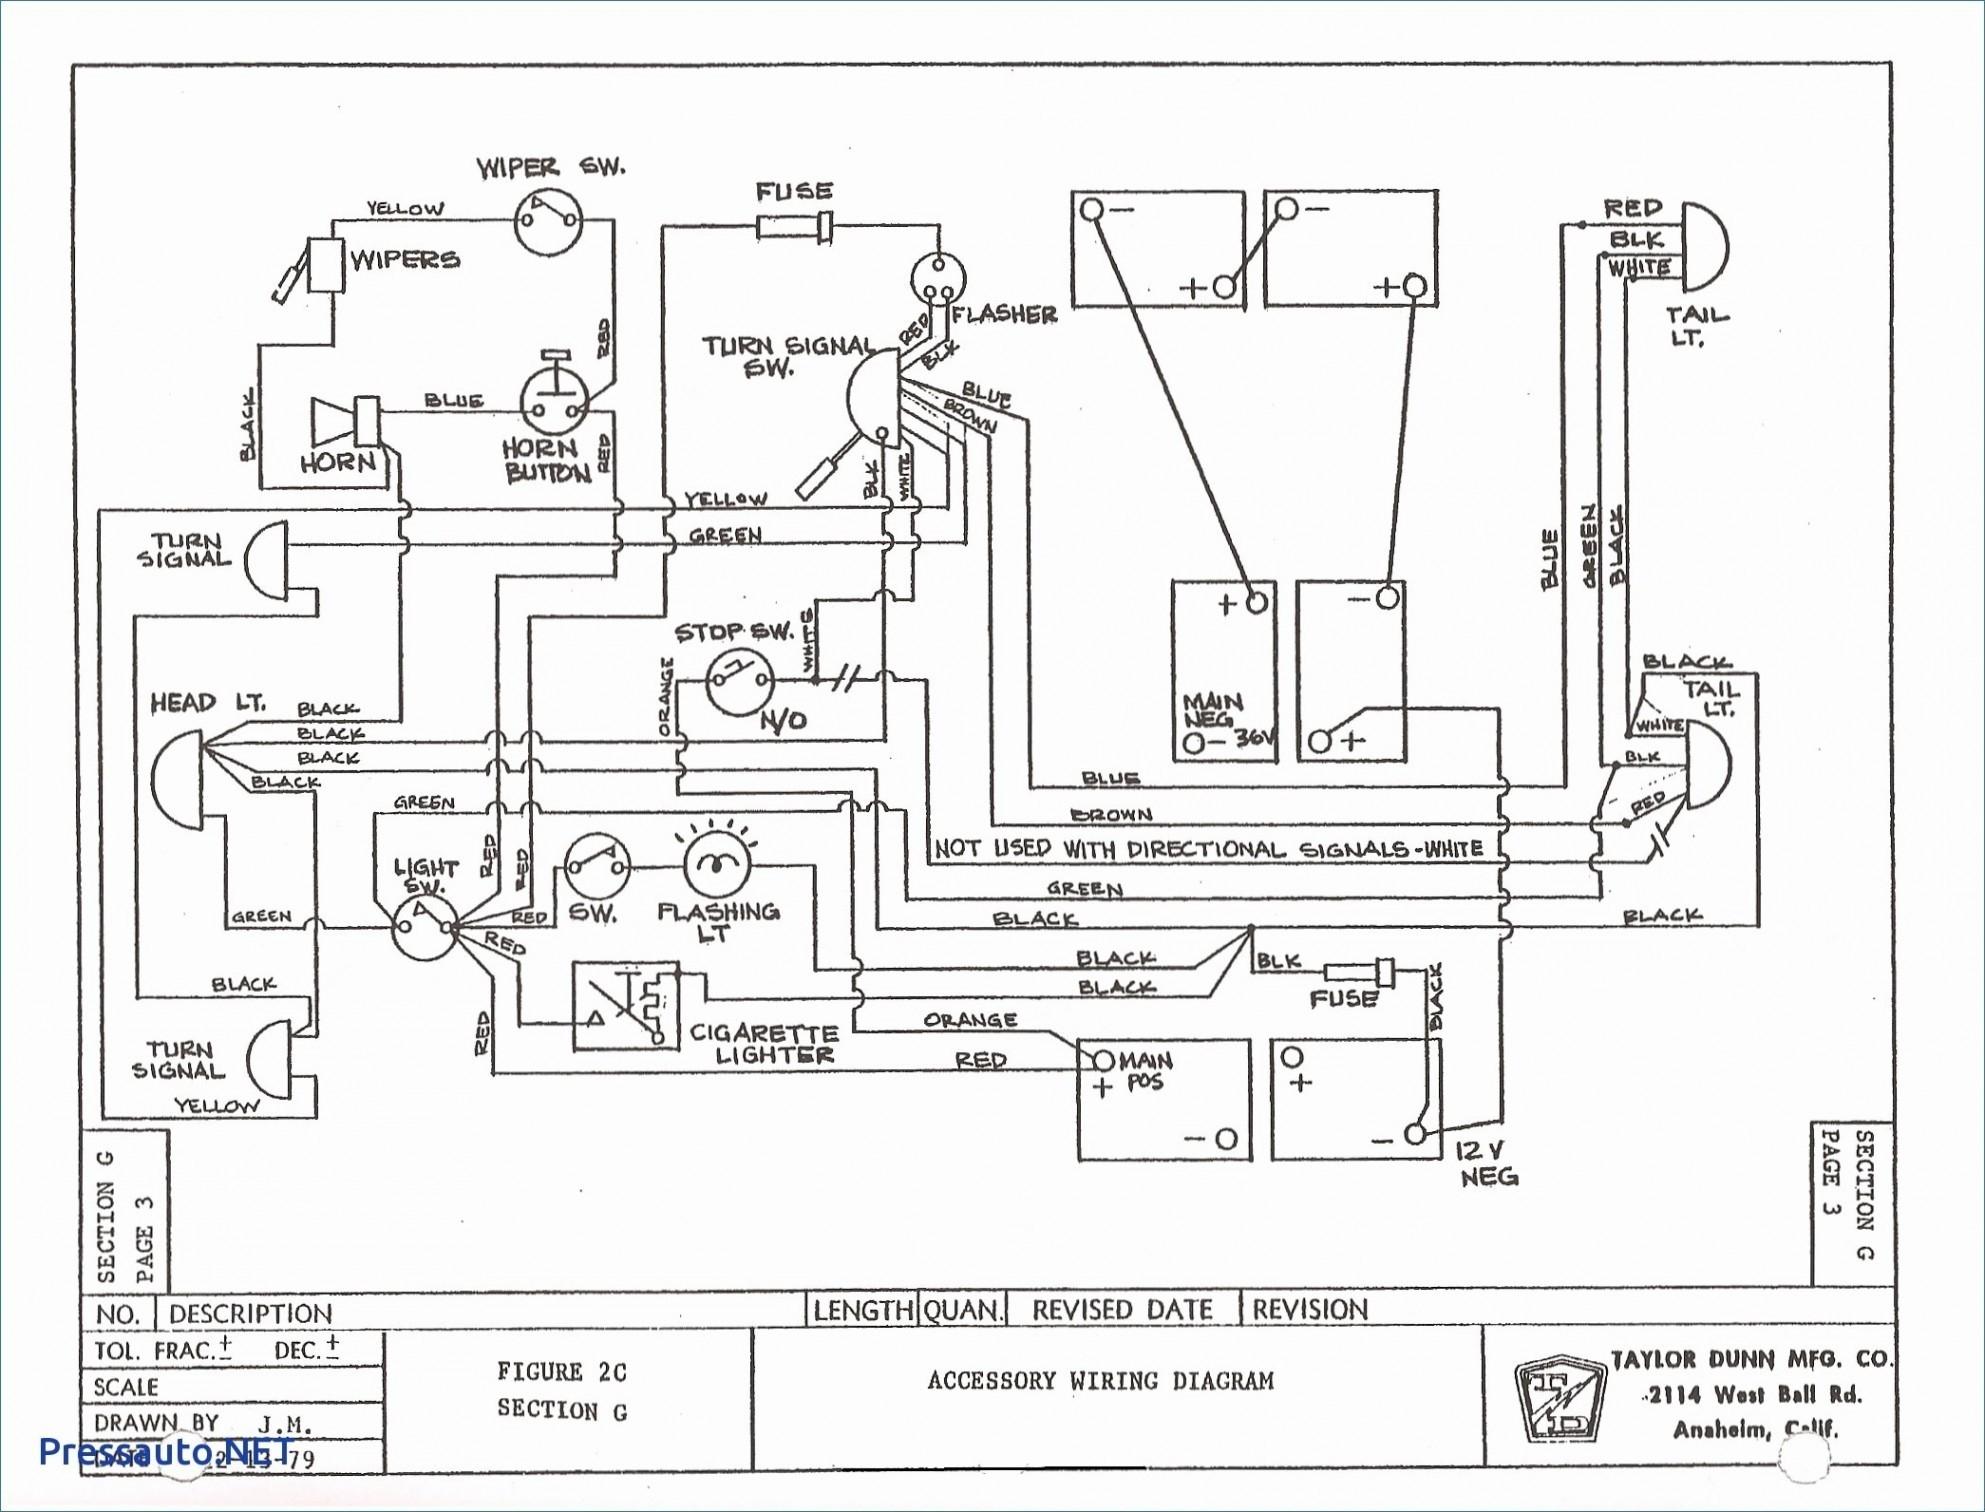 hight resolution of taylor dunn 36 volt wiring diagram wiring diagram ez go electric golf cart new ezgo